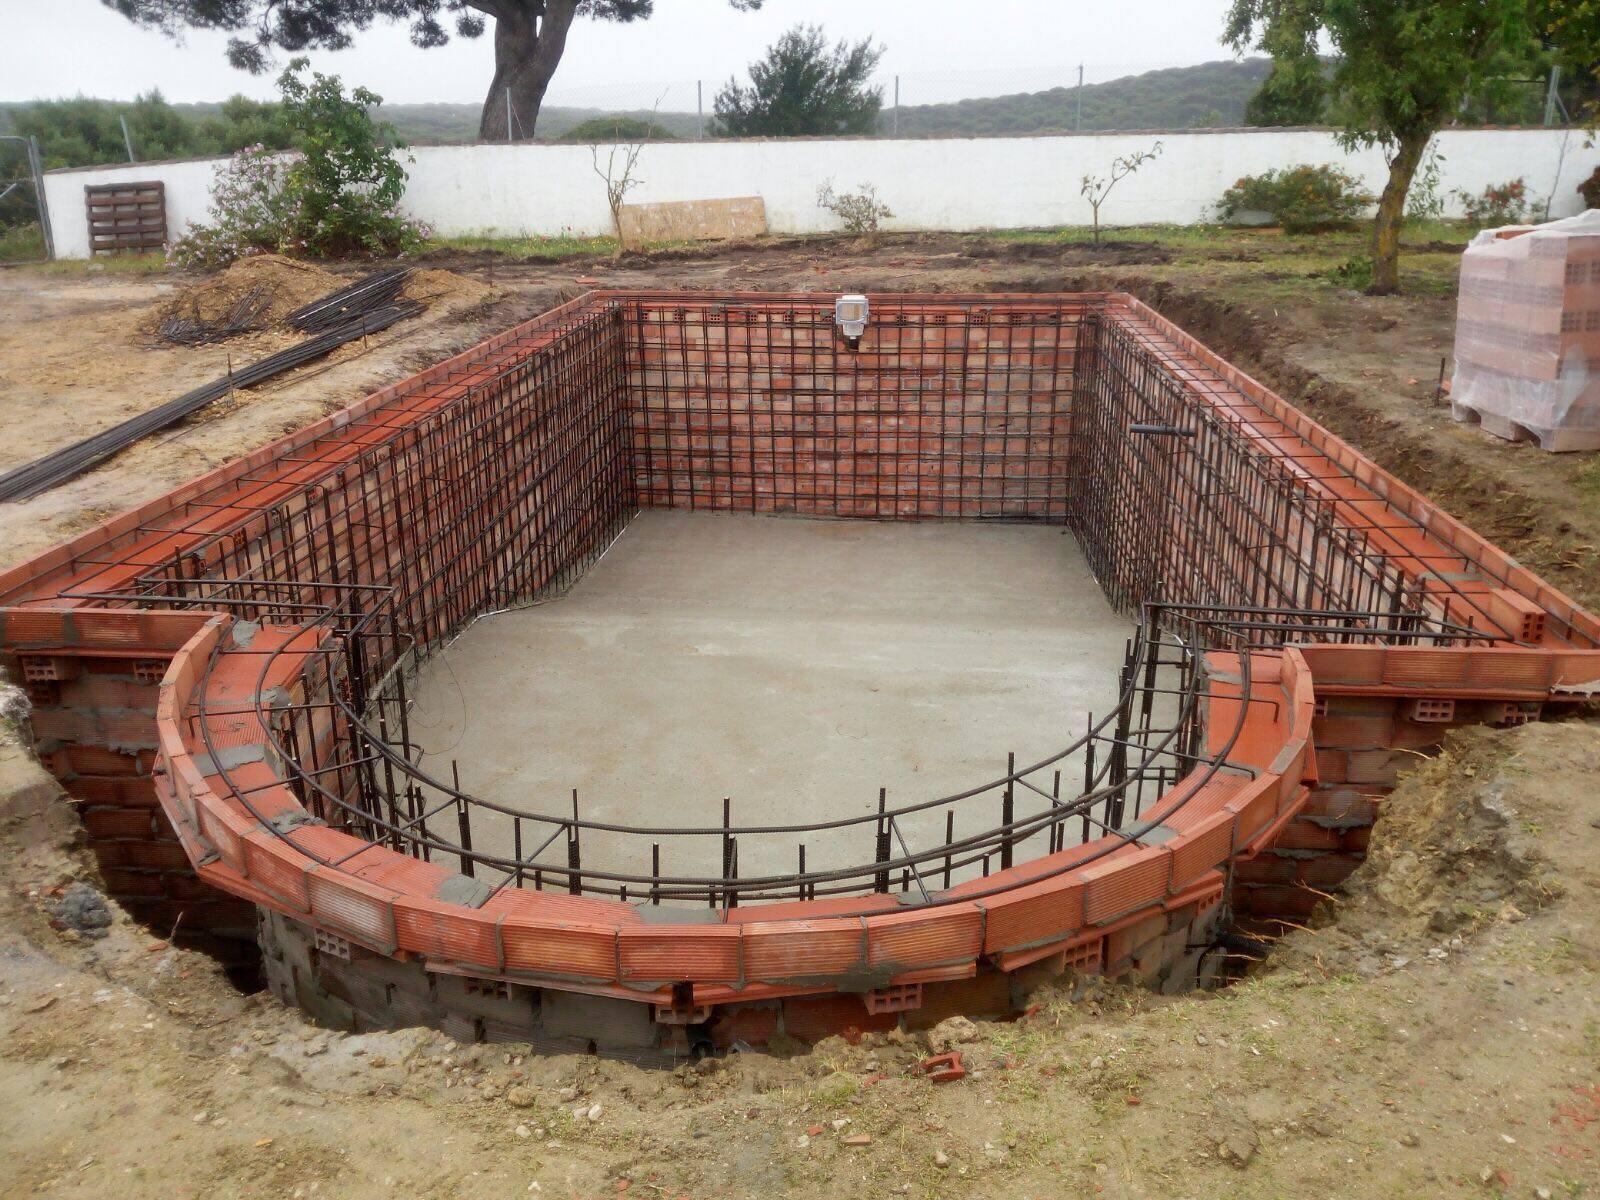 Brand new pool construction barbate cadiz for New pool installation